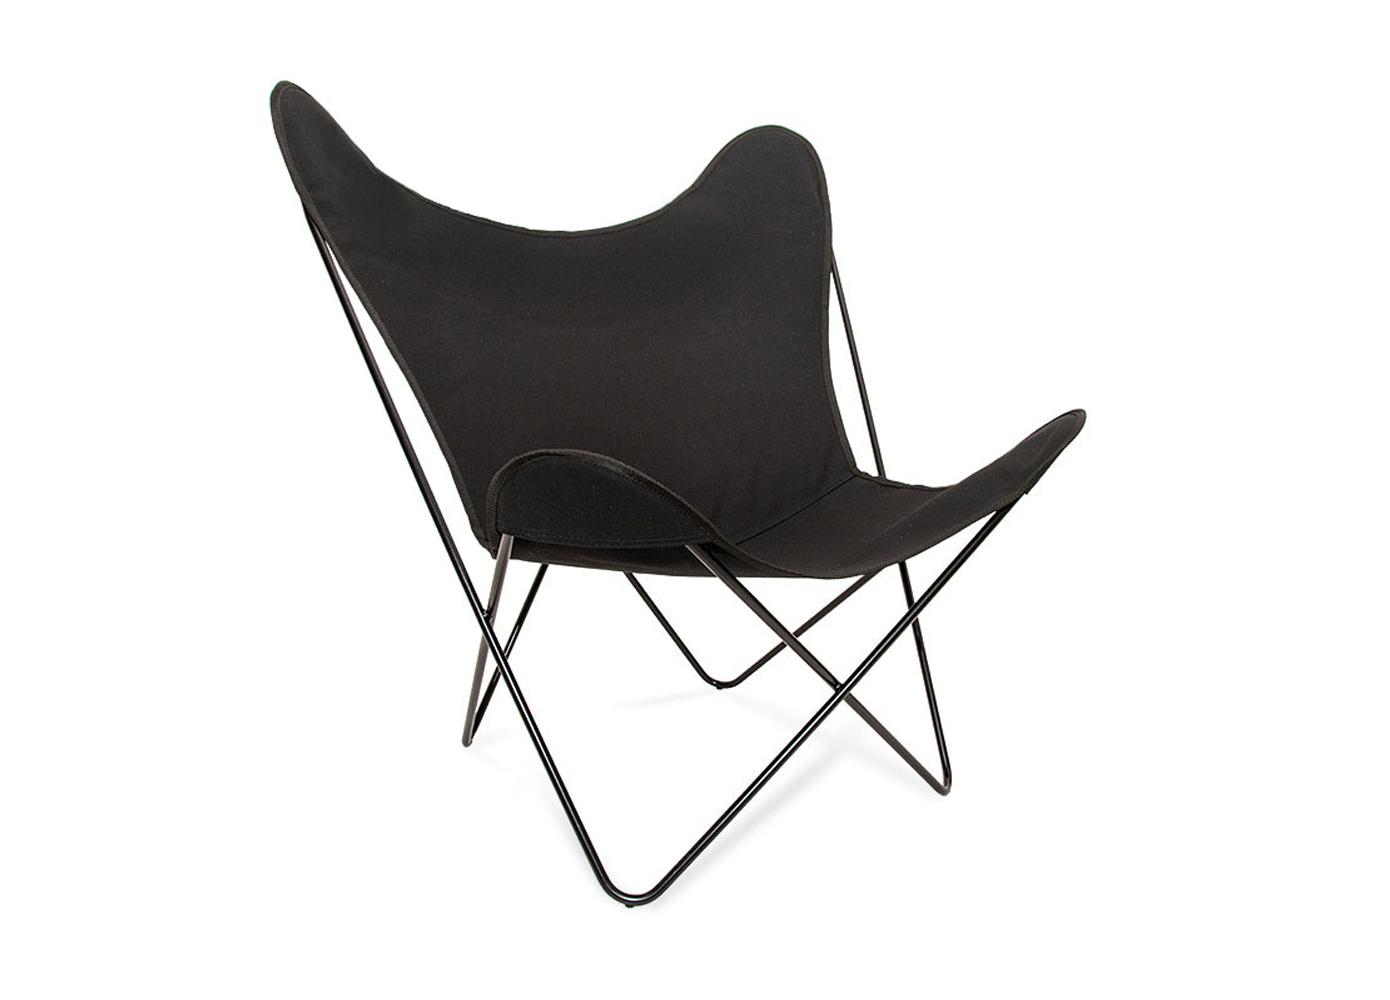 Hardoy Chair Hardoy Chair Butterfly Hardoy Butterfly yvN08nwOm